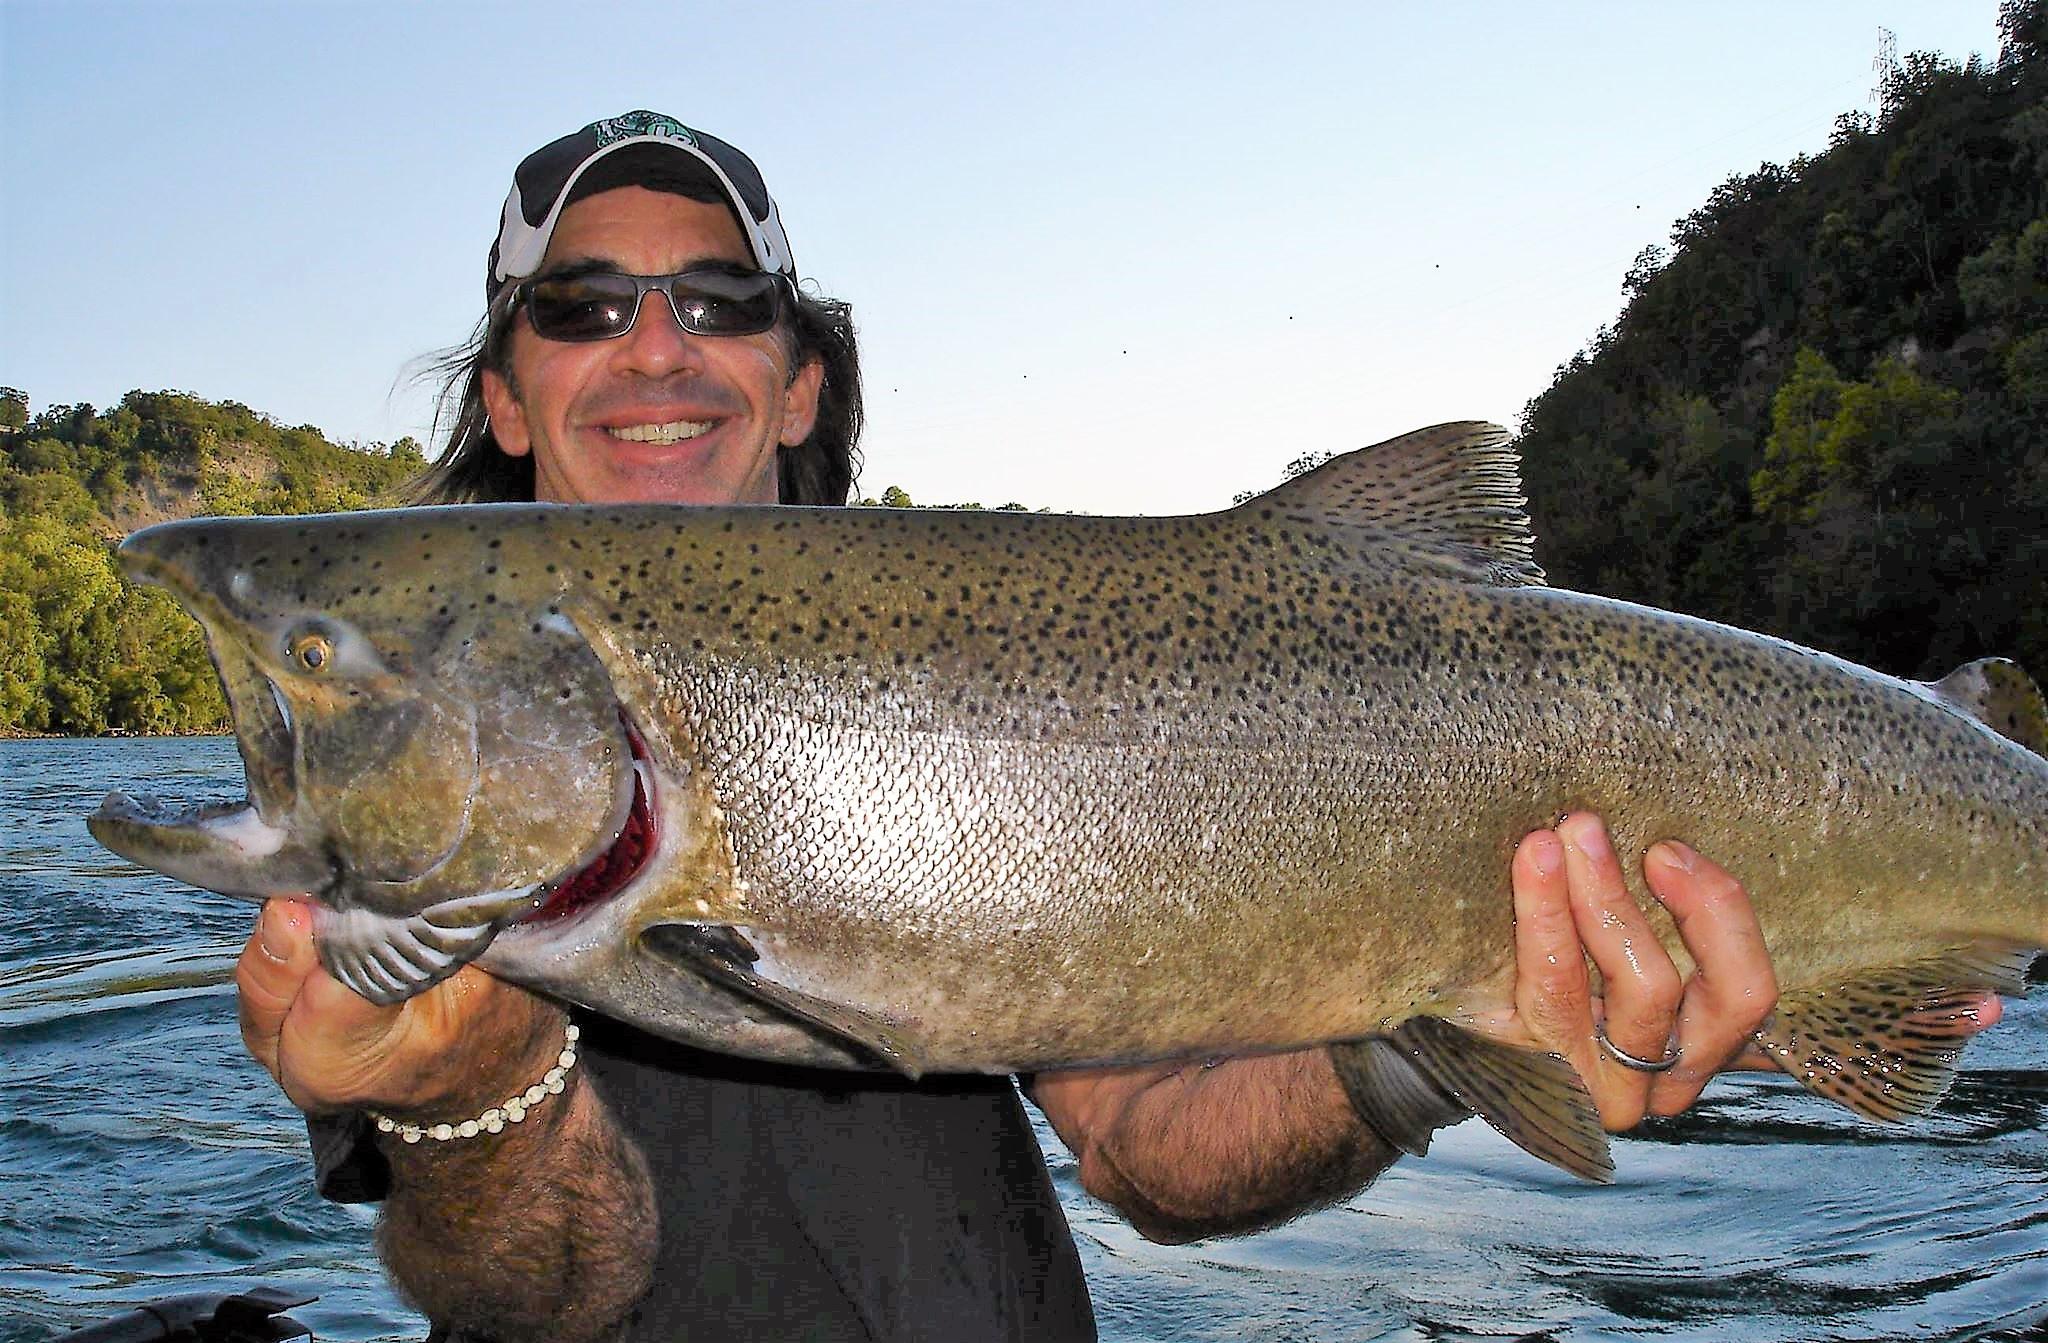 KING SALMON on the Bite! Niagara Falls USA Fishing Forecast, Wednesday, Sept. 26, 2018: from Destination Niagara USA